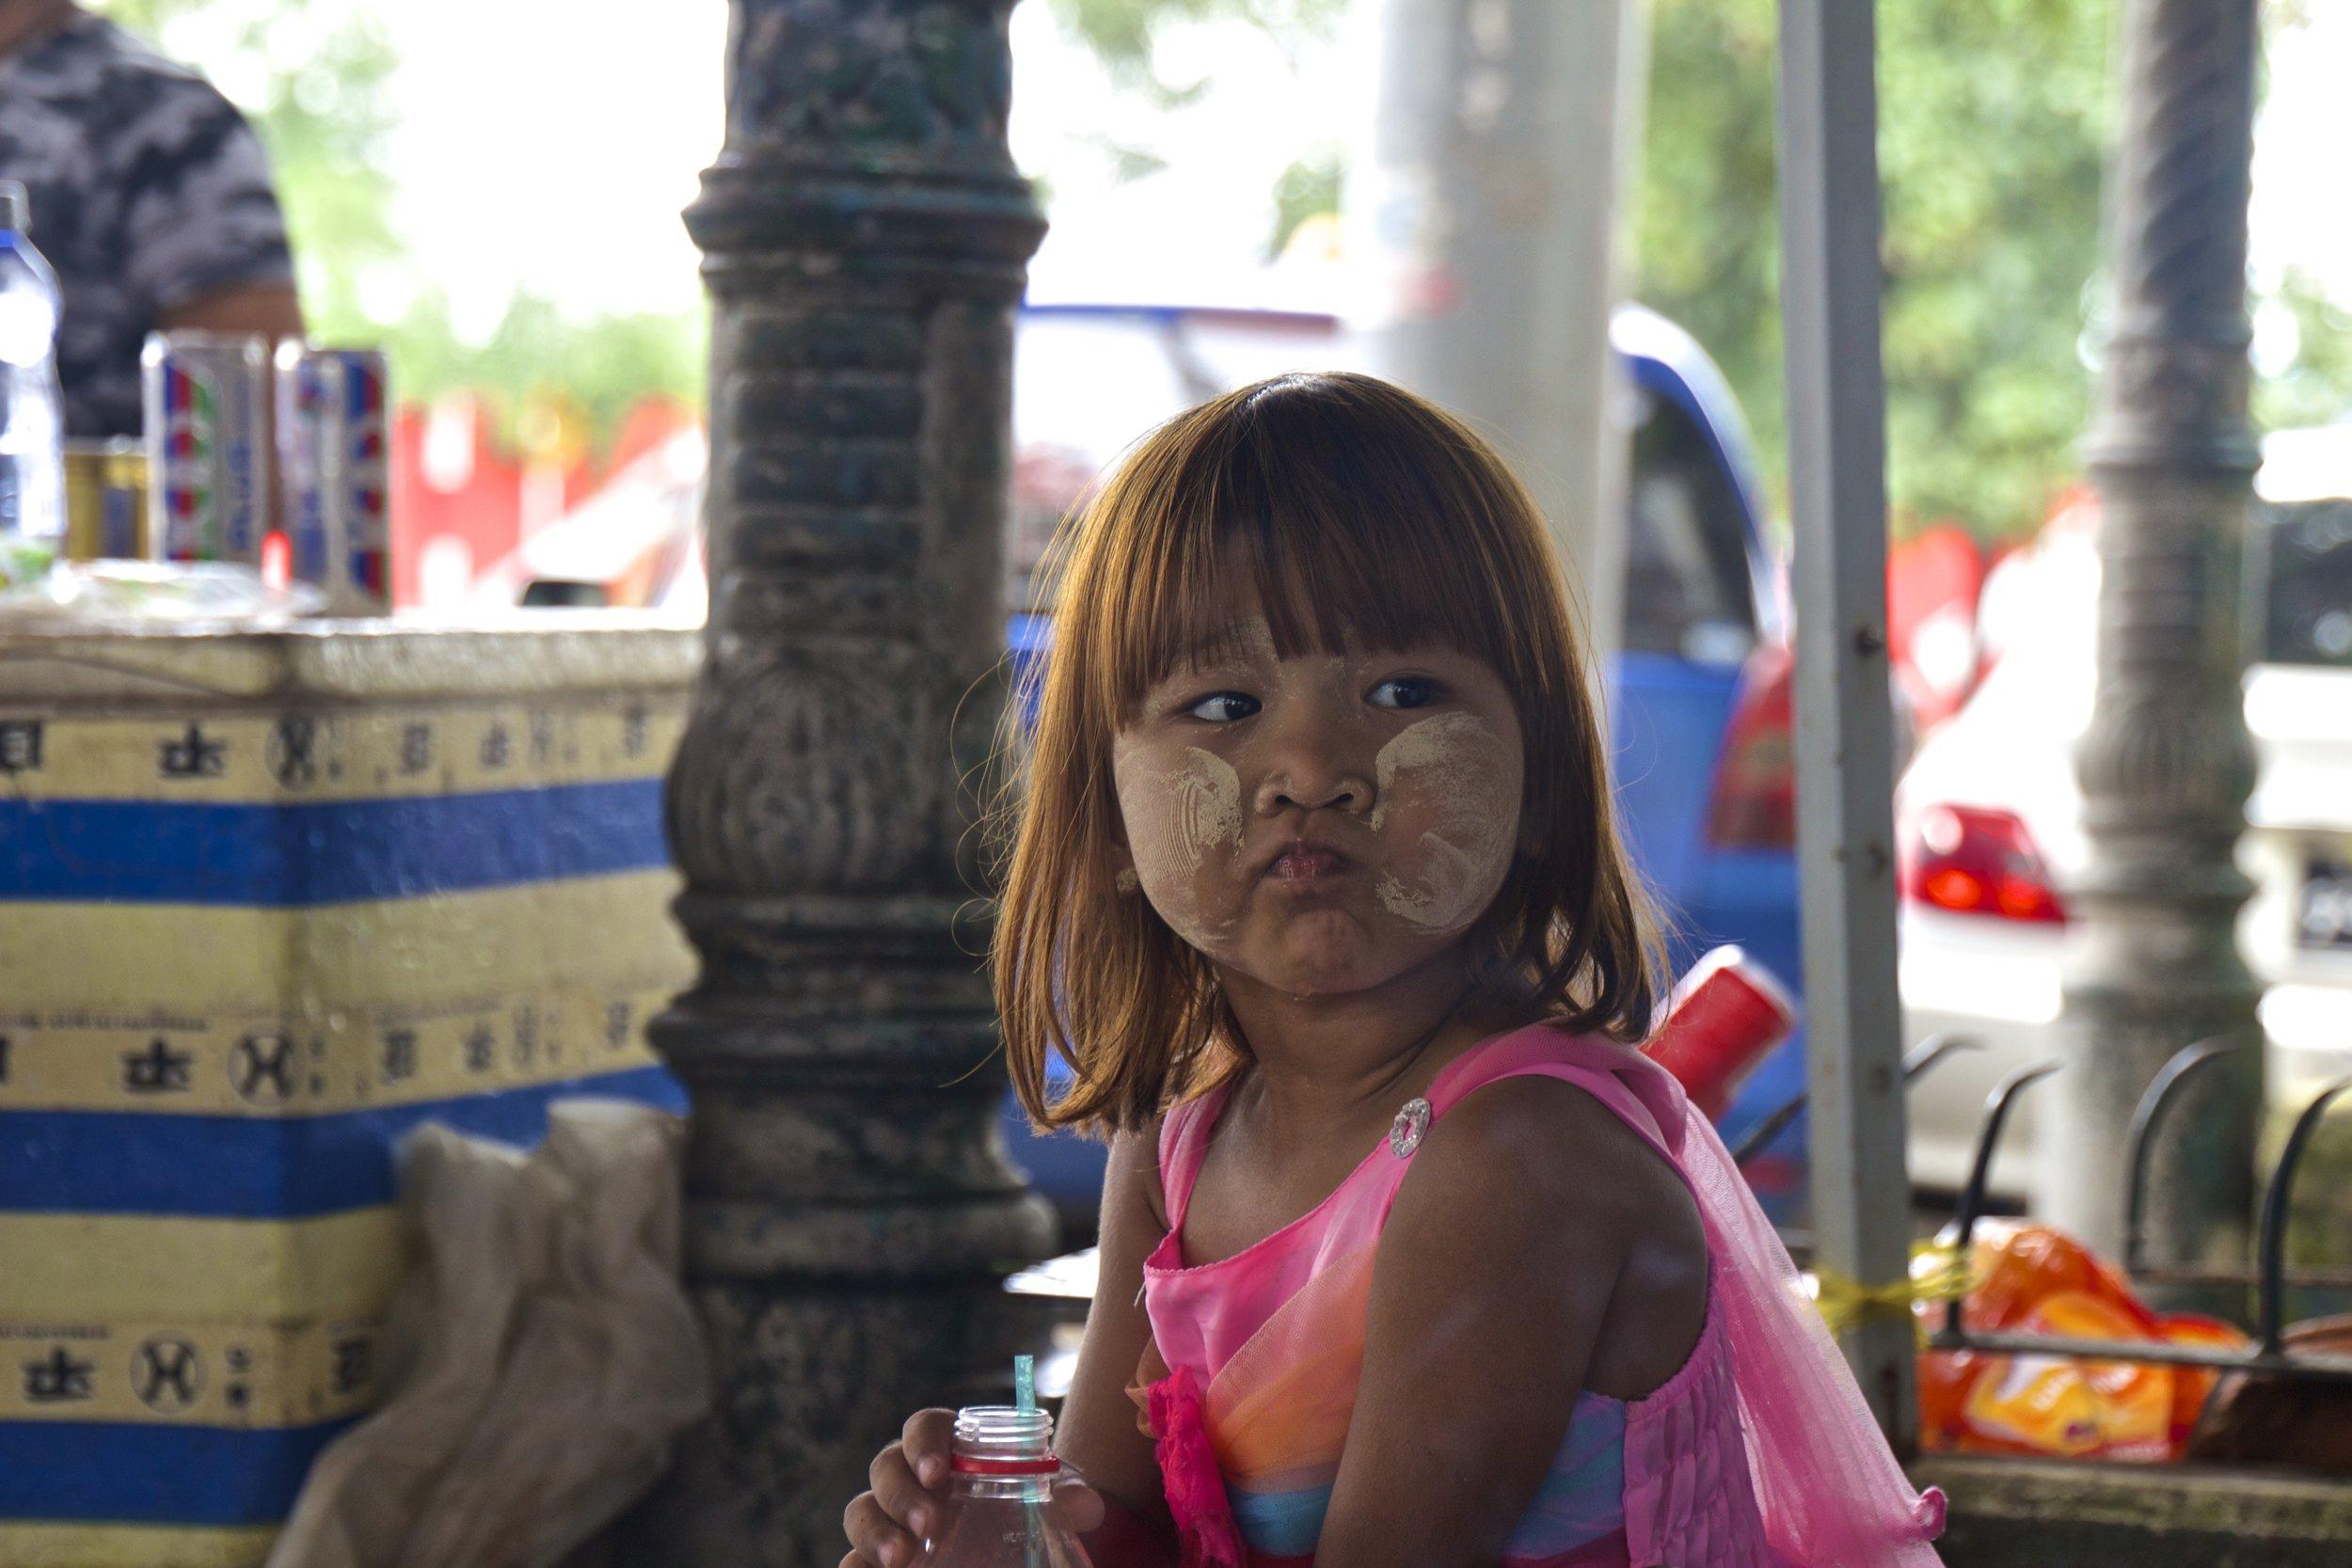 rangoon burma yangon myanmar 7.jpg